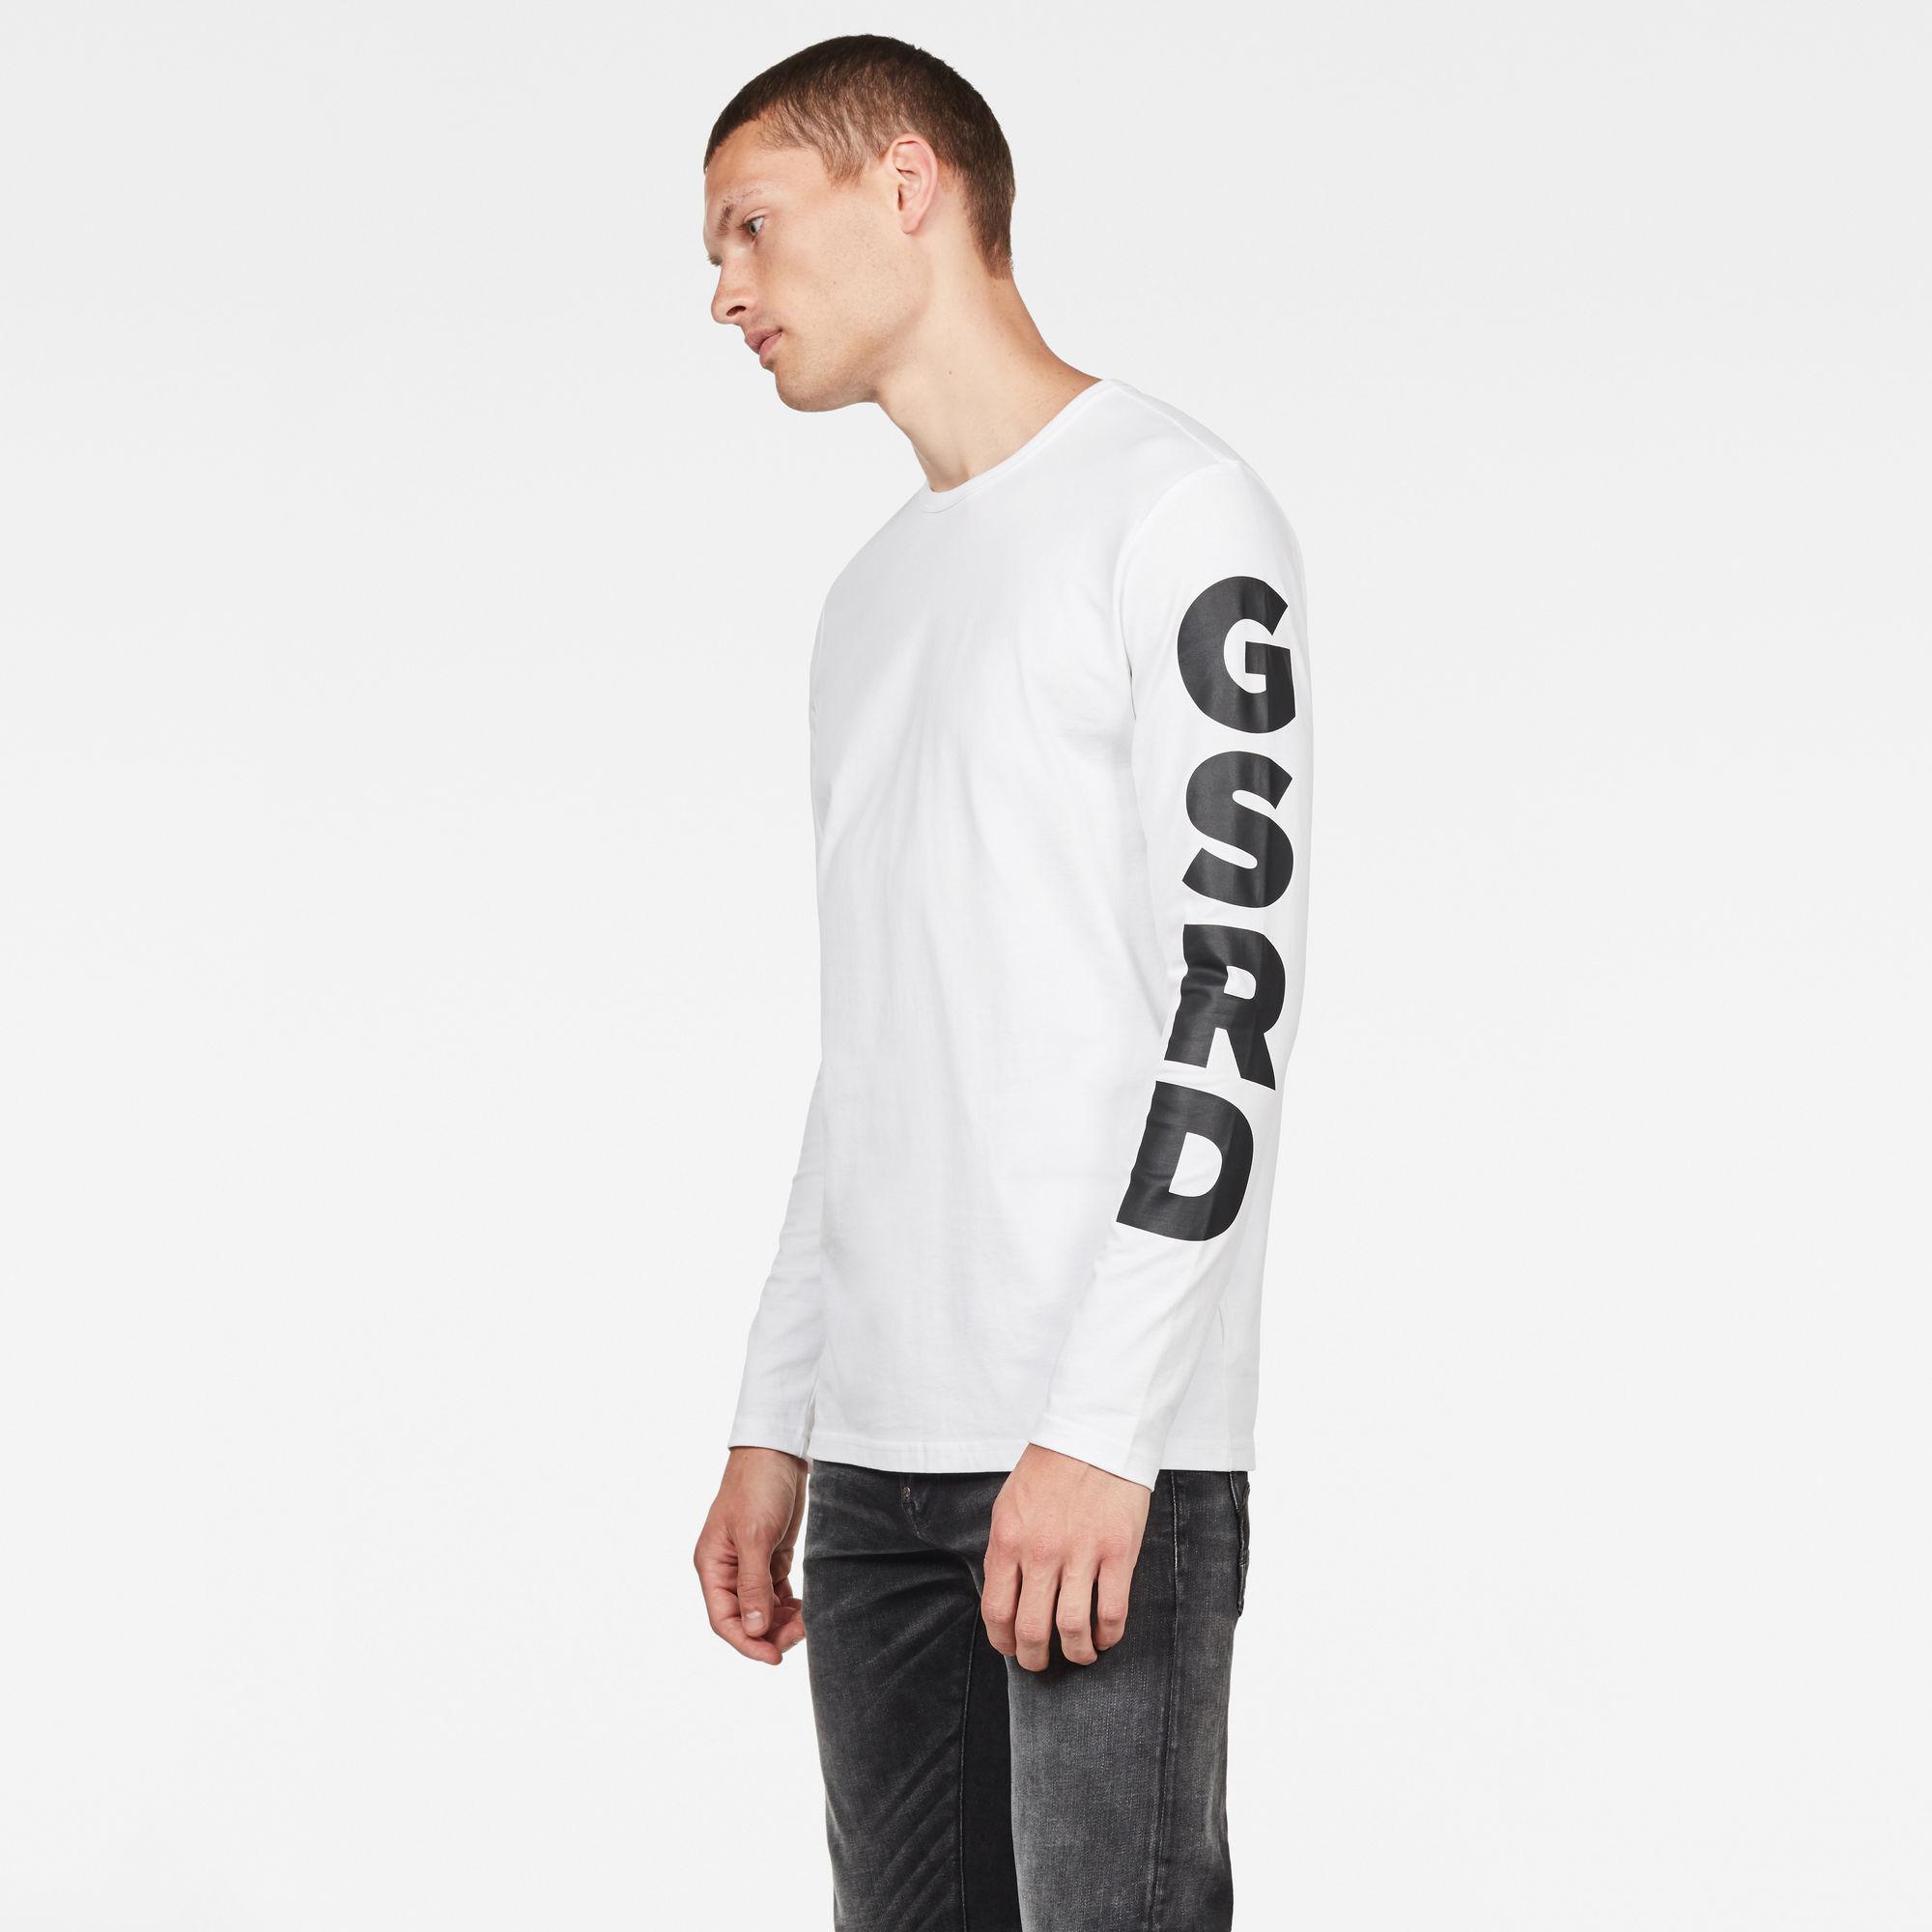 Ghasu T-Shirt